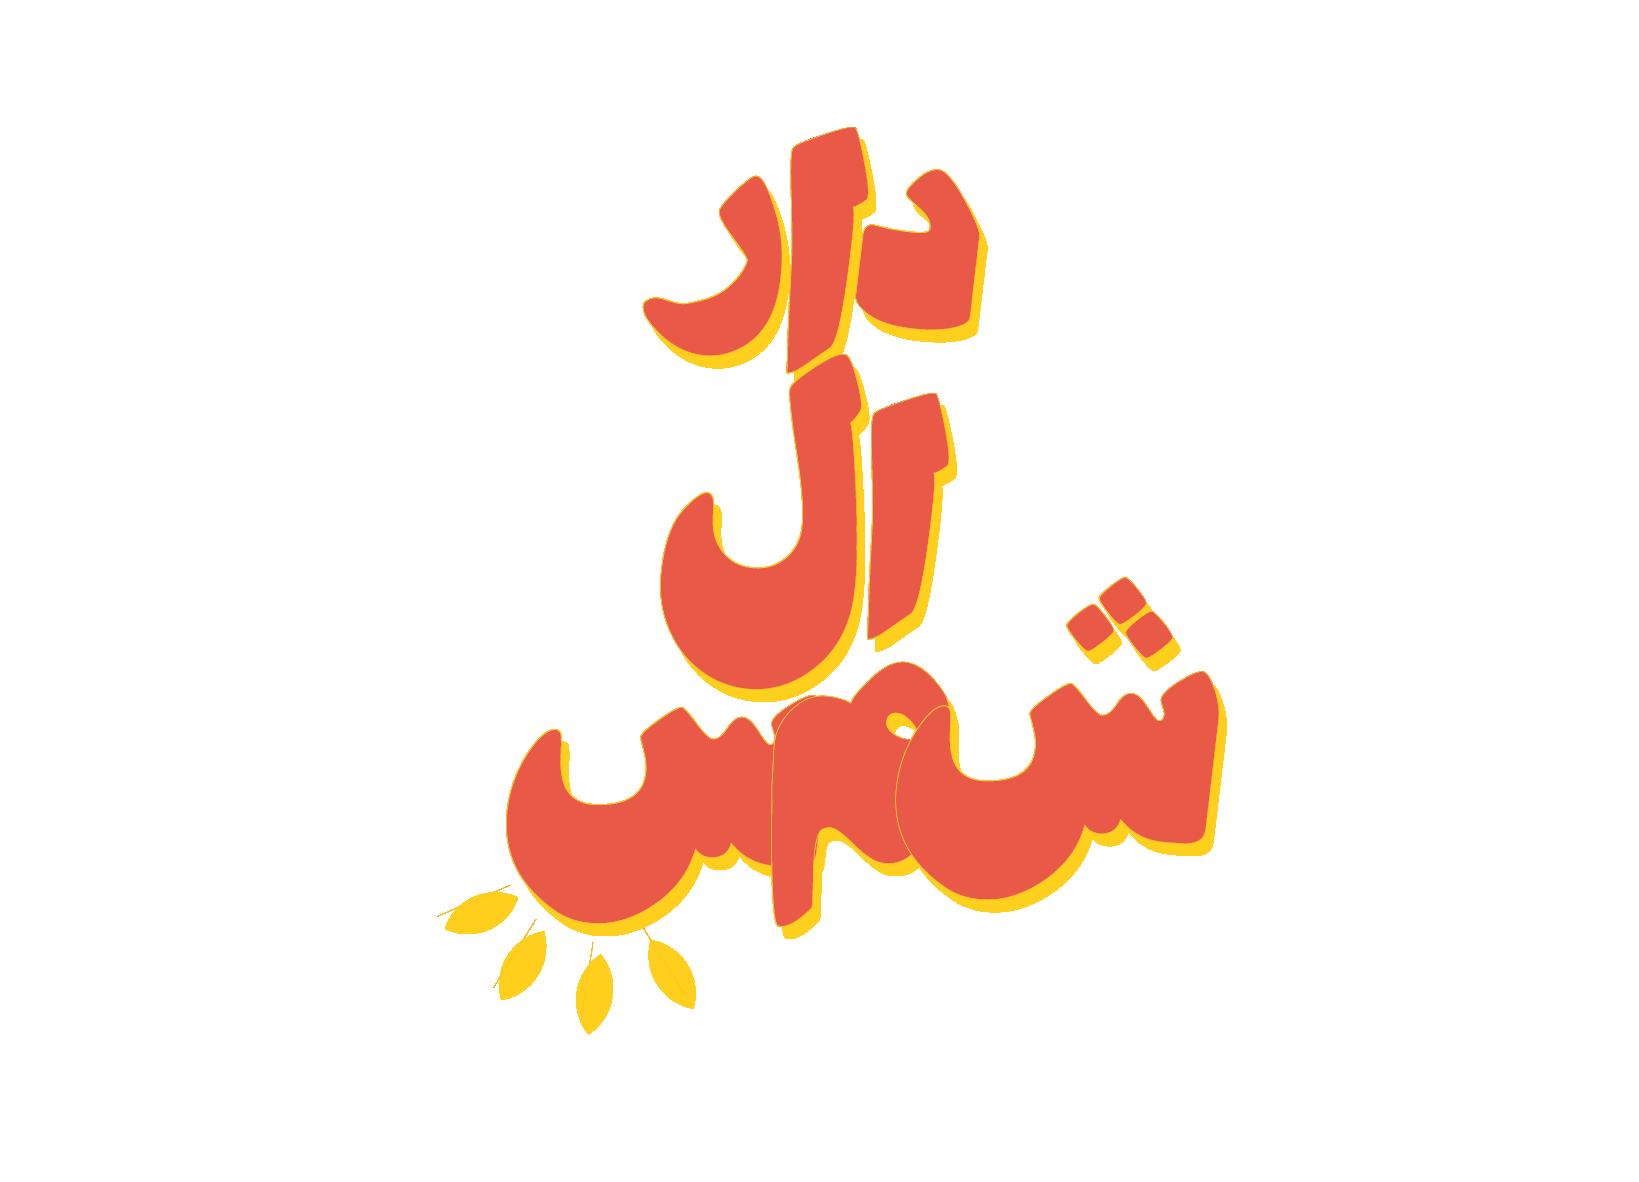 logo_Dar al Shams_final-15.png